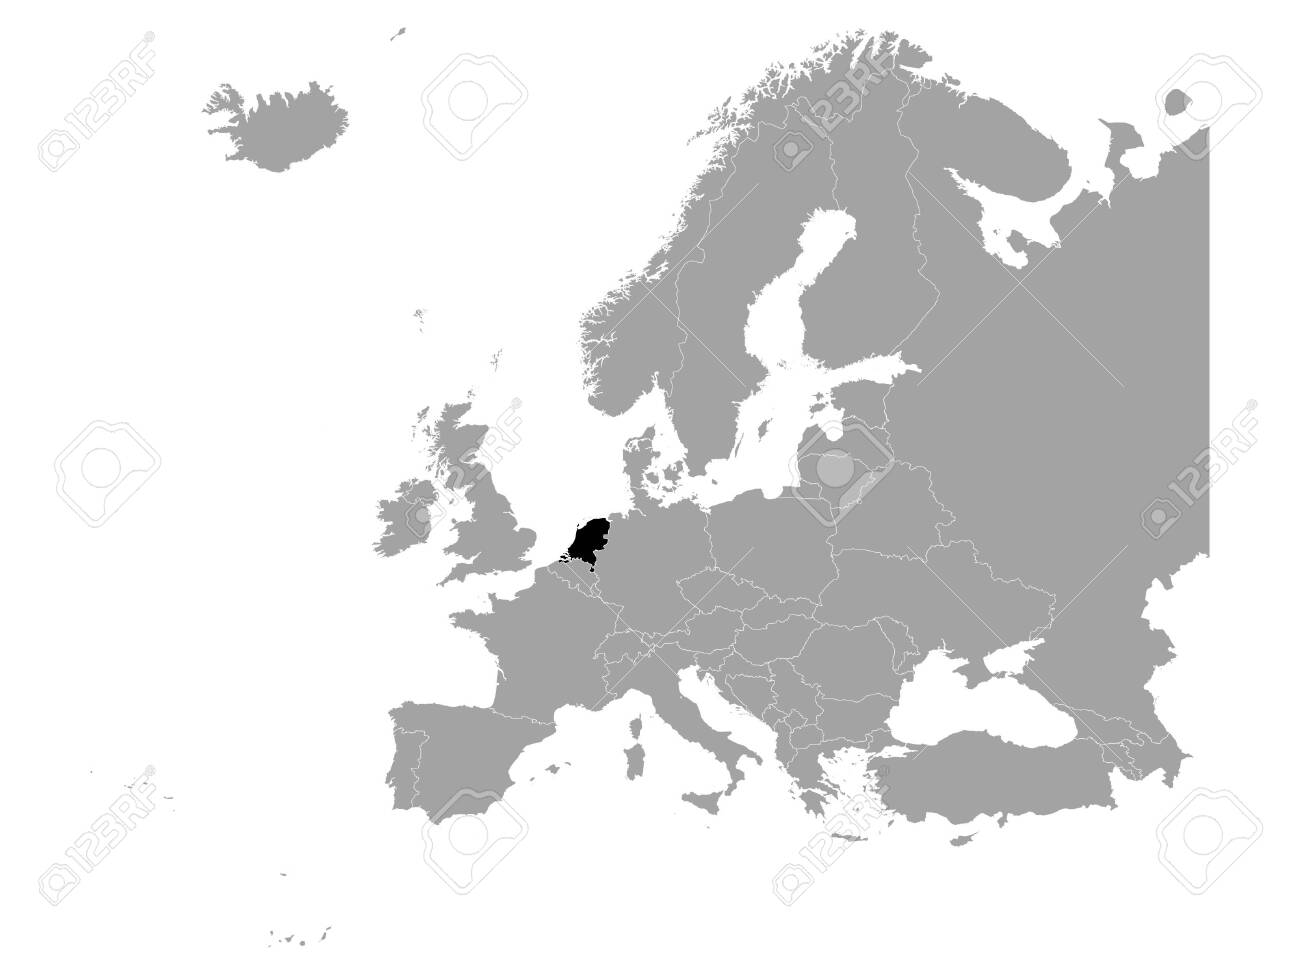 vector illustration of Black map of Netherlands - 141881942